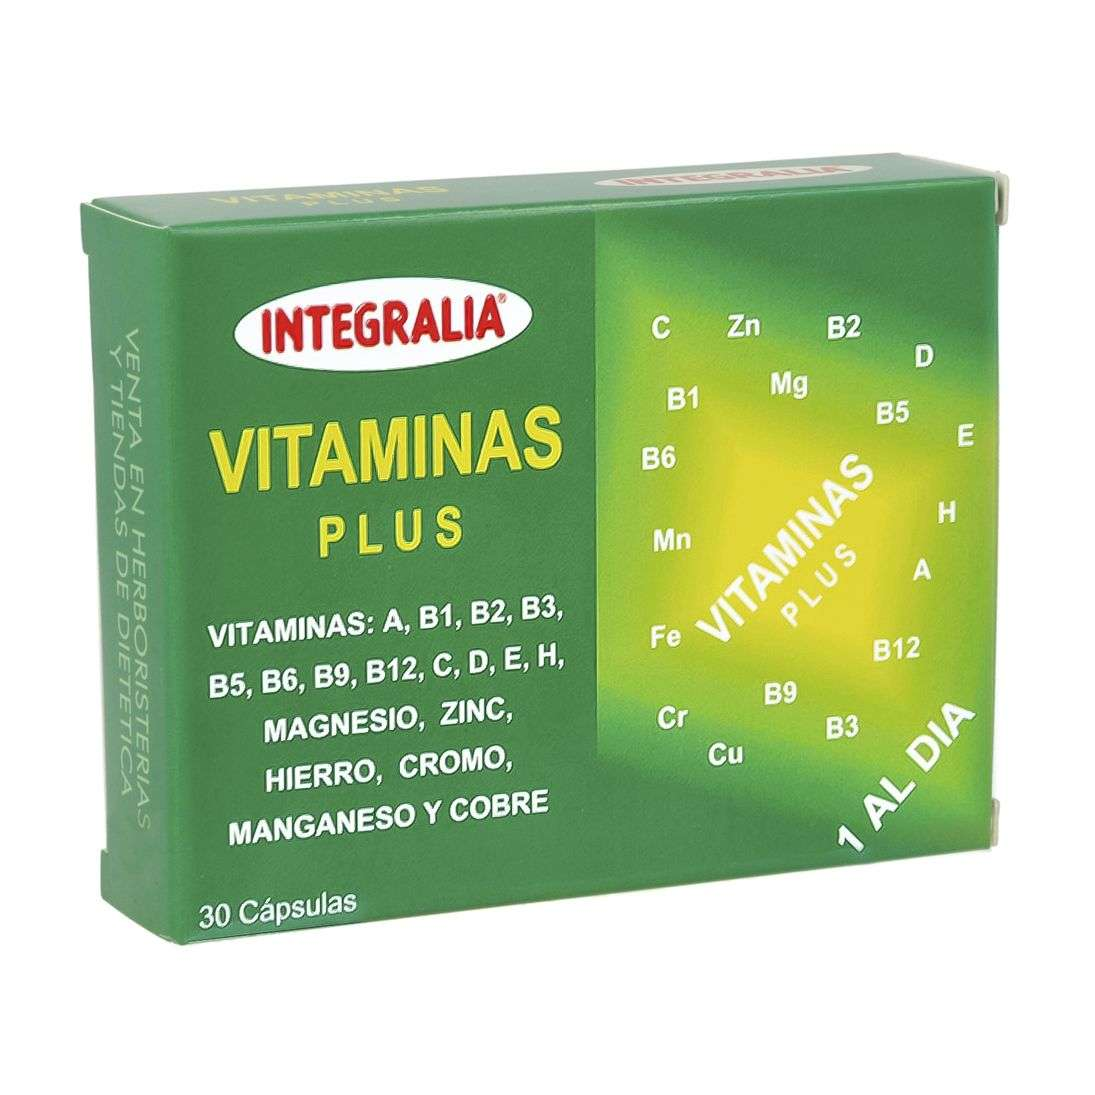 Vitaminas Plus